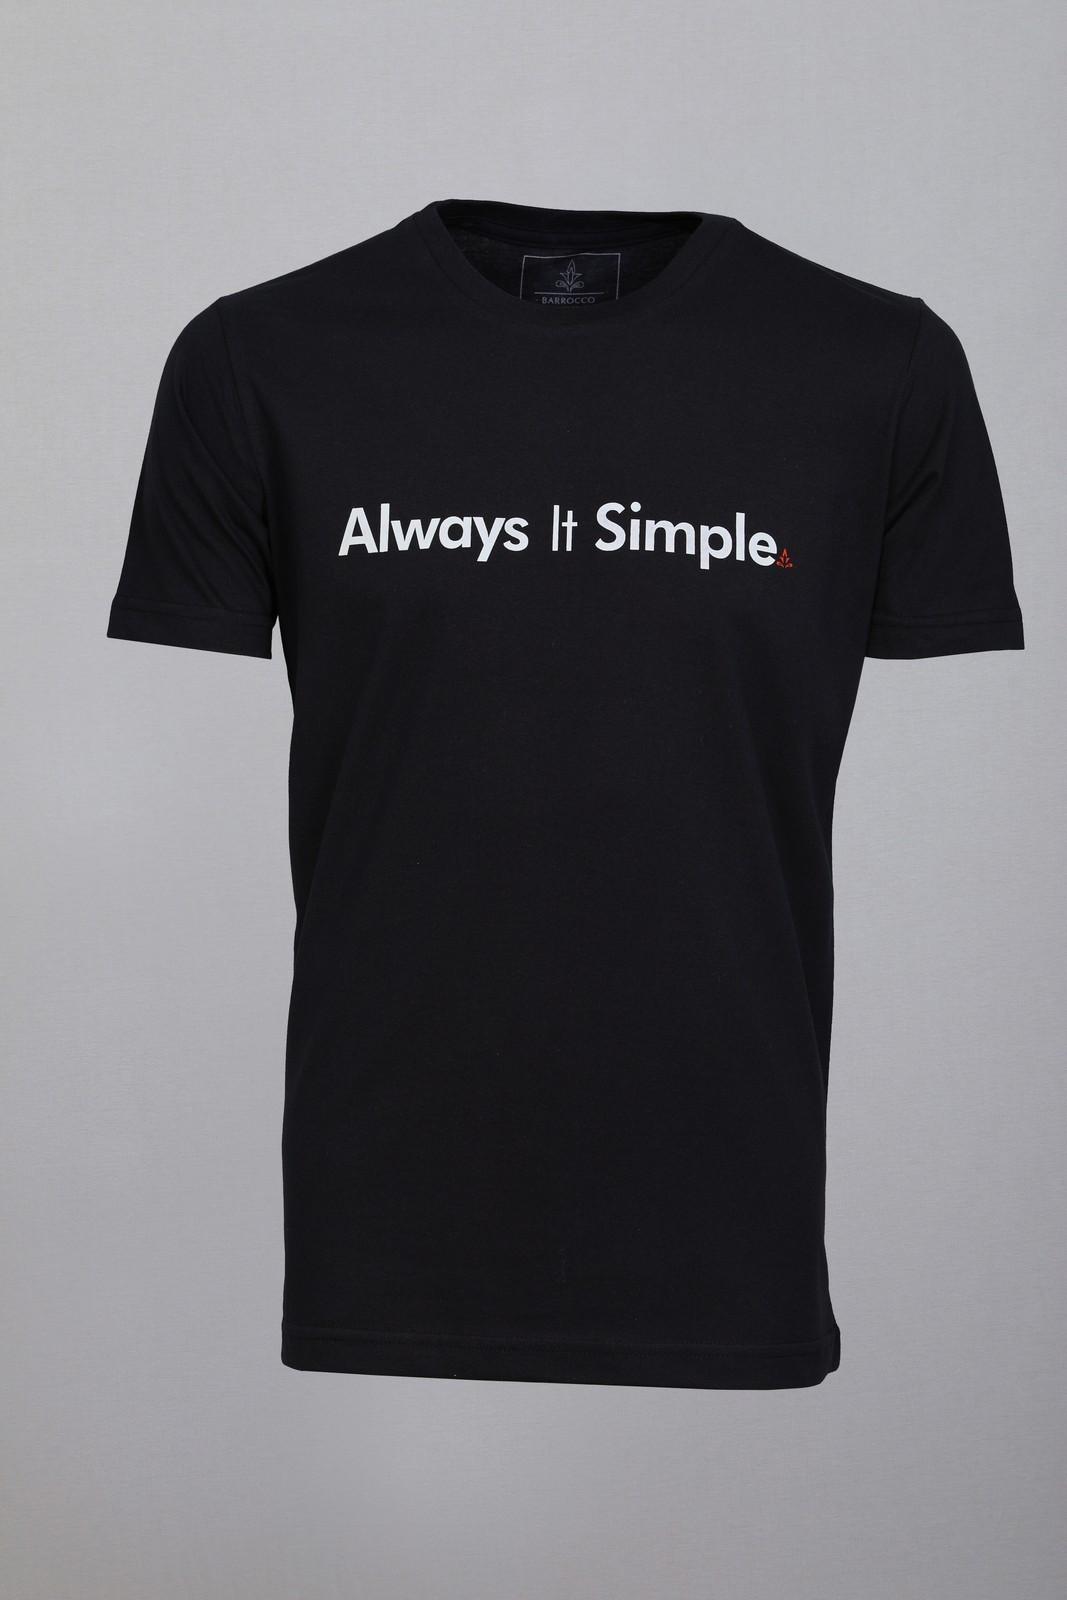 Camiseta Barrocco Always It Simple Preta